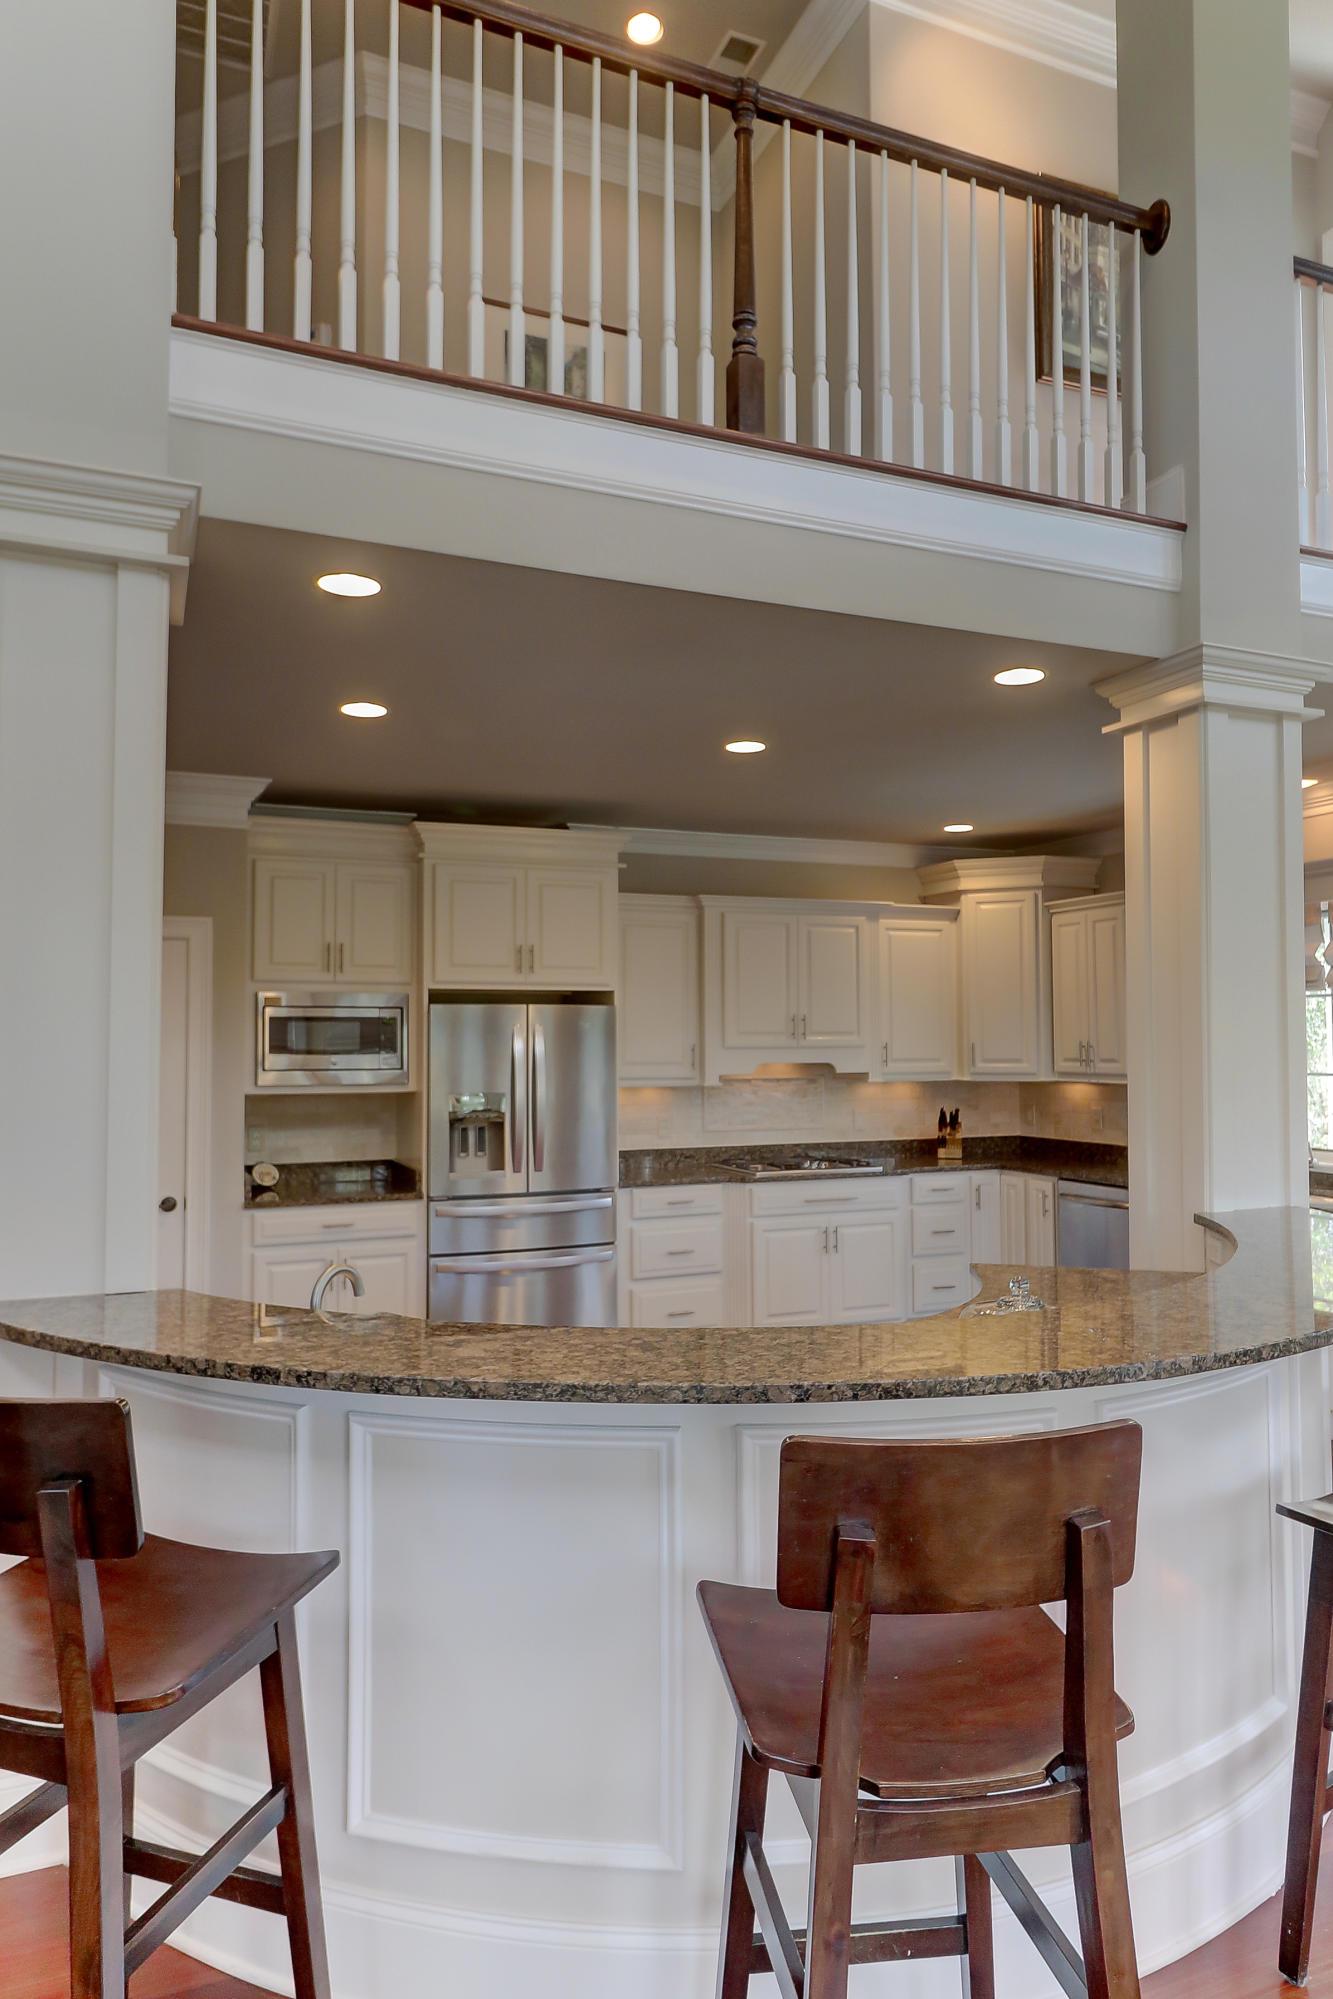 Dunes West Homes For Sale - 2996 Pignatelli Crescent, Mount Pleasant, SC - 115